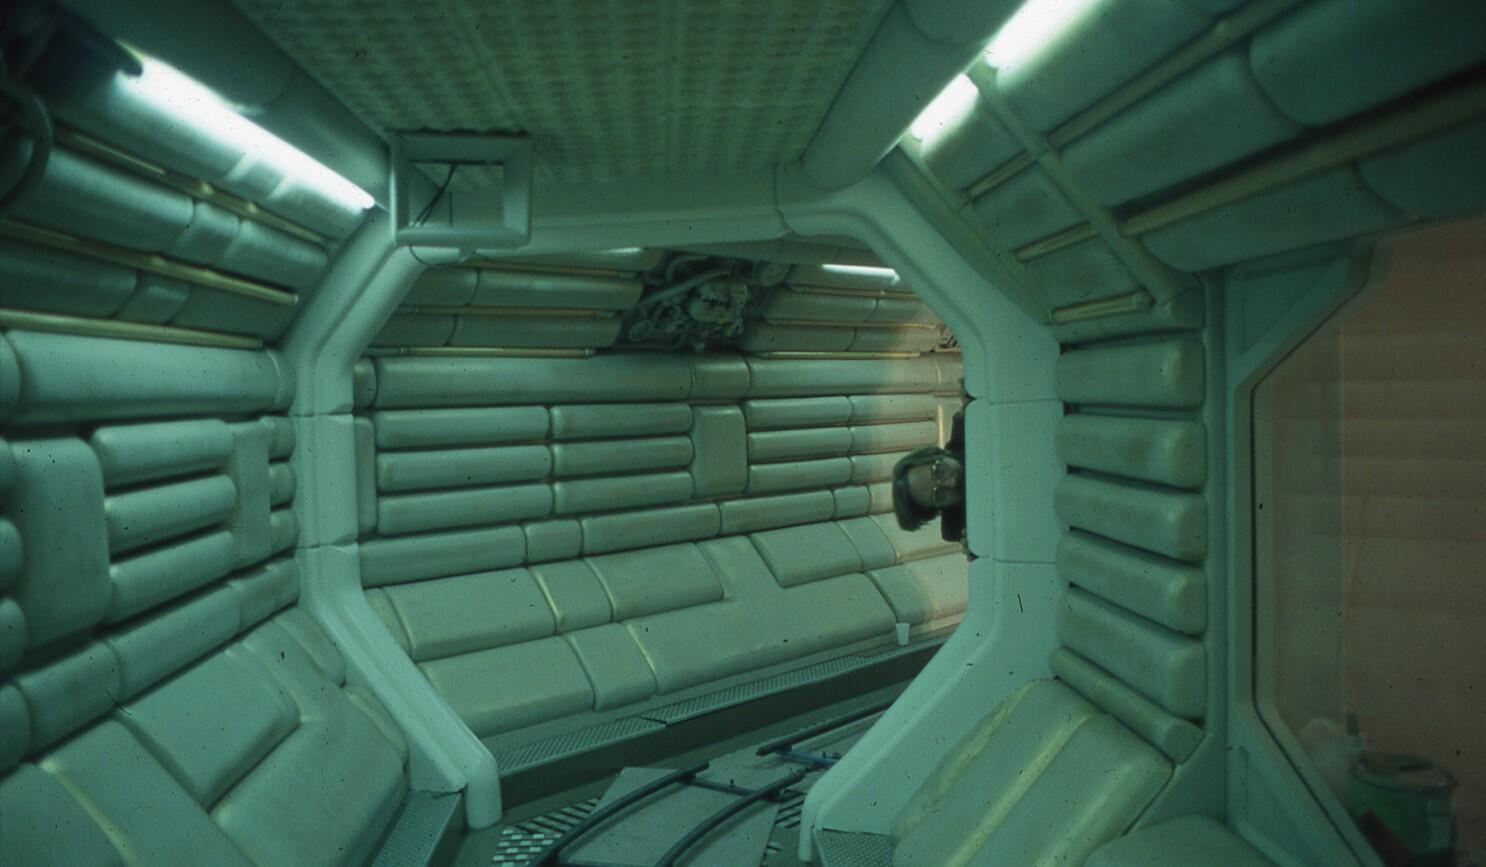 Review Memory The Origins Of Alien Unpacks Sci Fi Classic Los Angeles Times